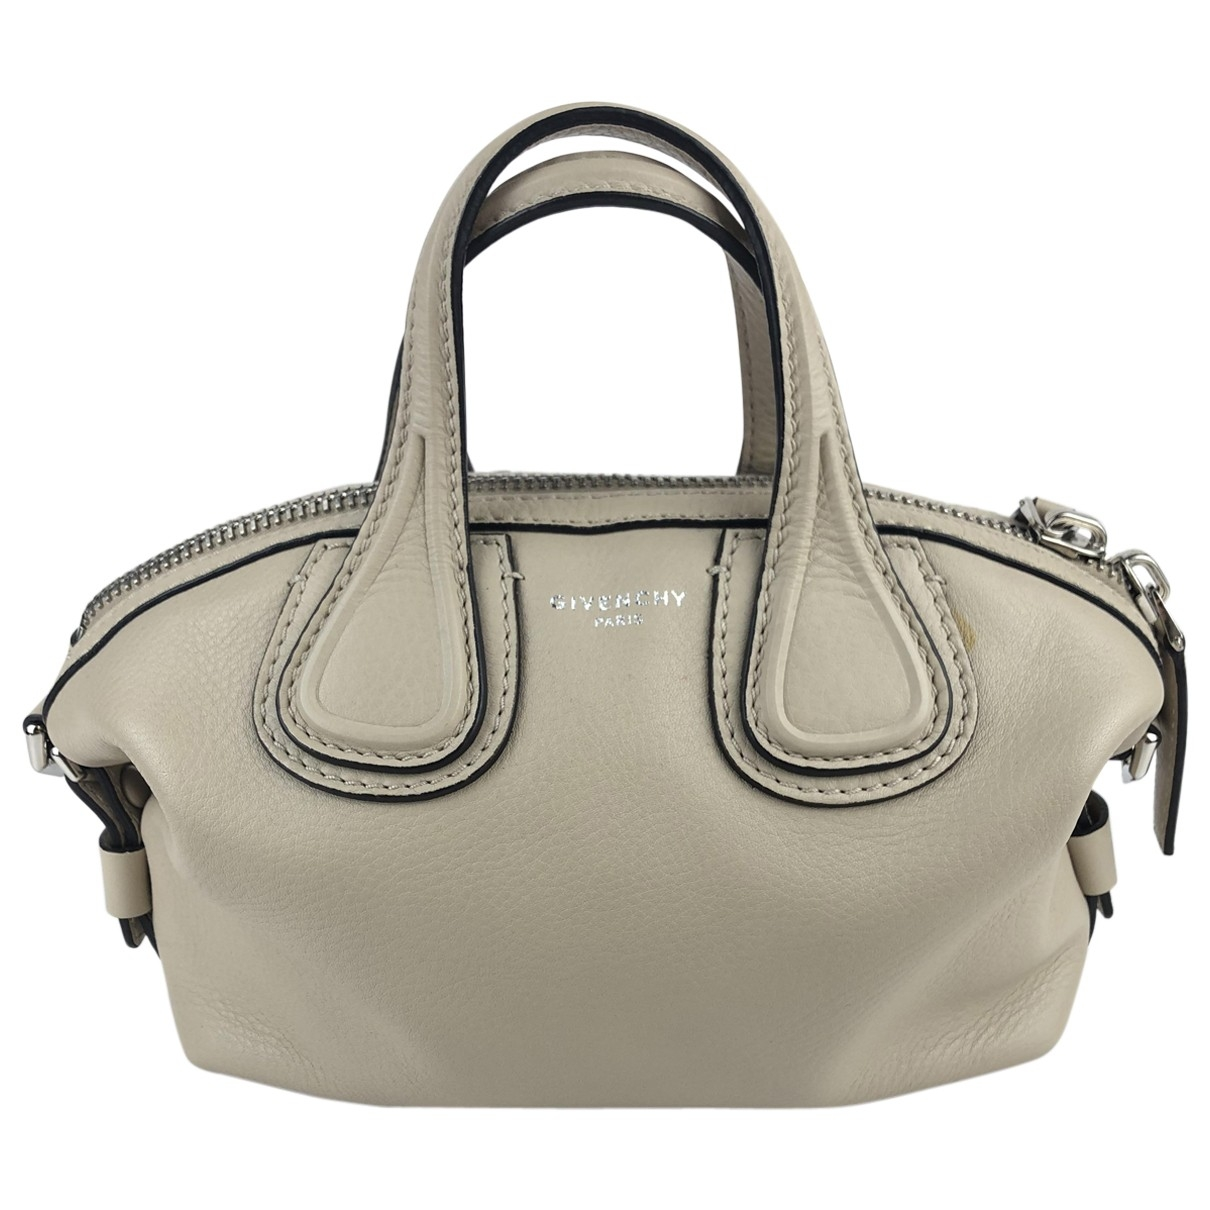 Givenchy Nightingale Beige Leather handbag for Women \N